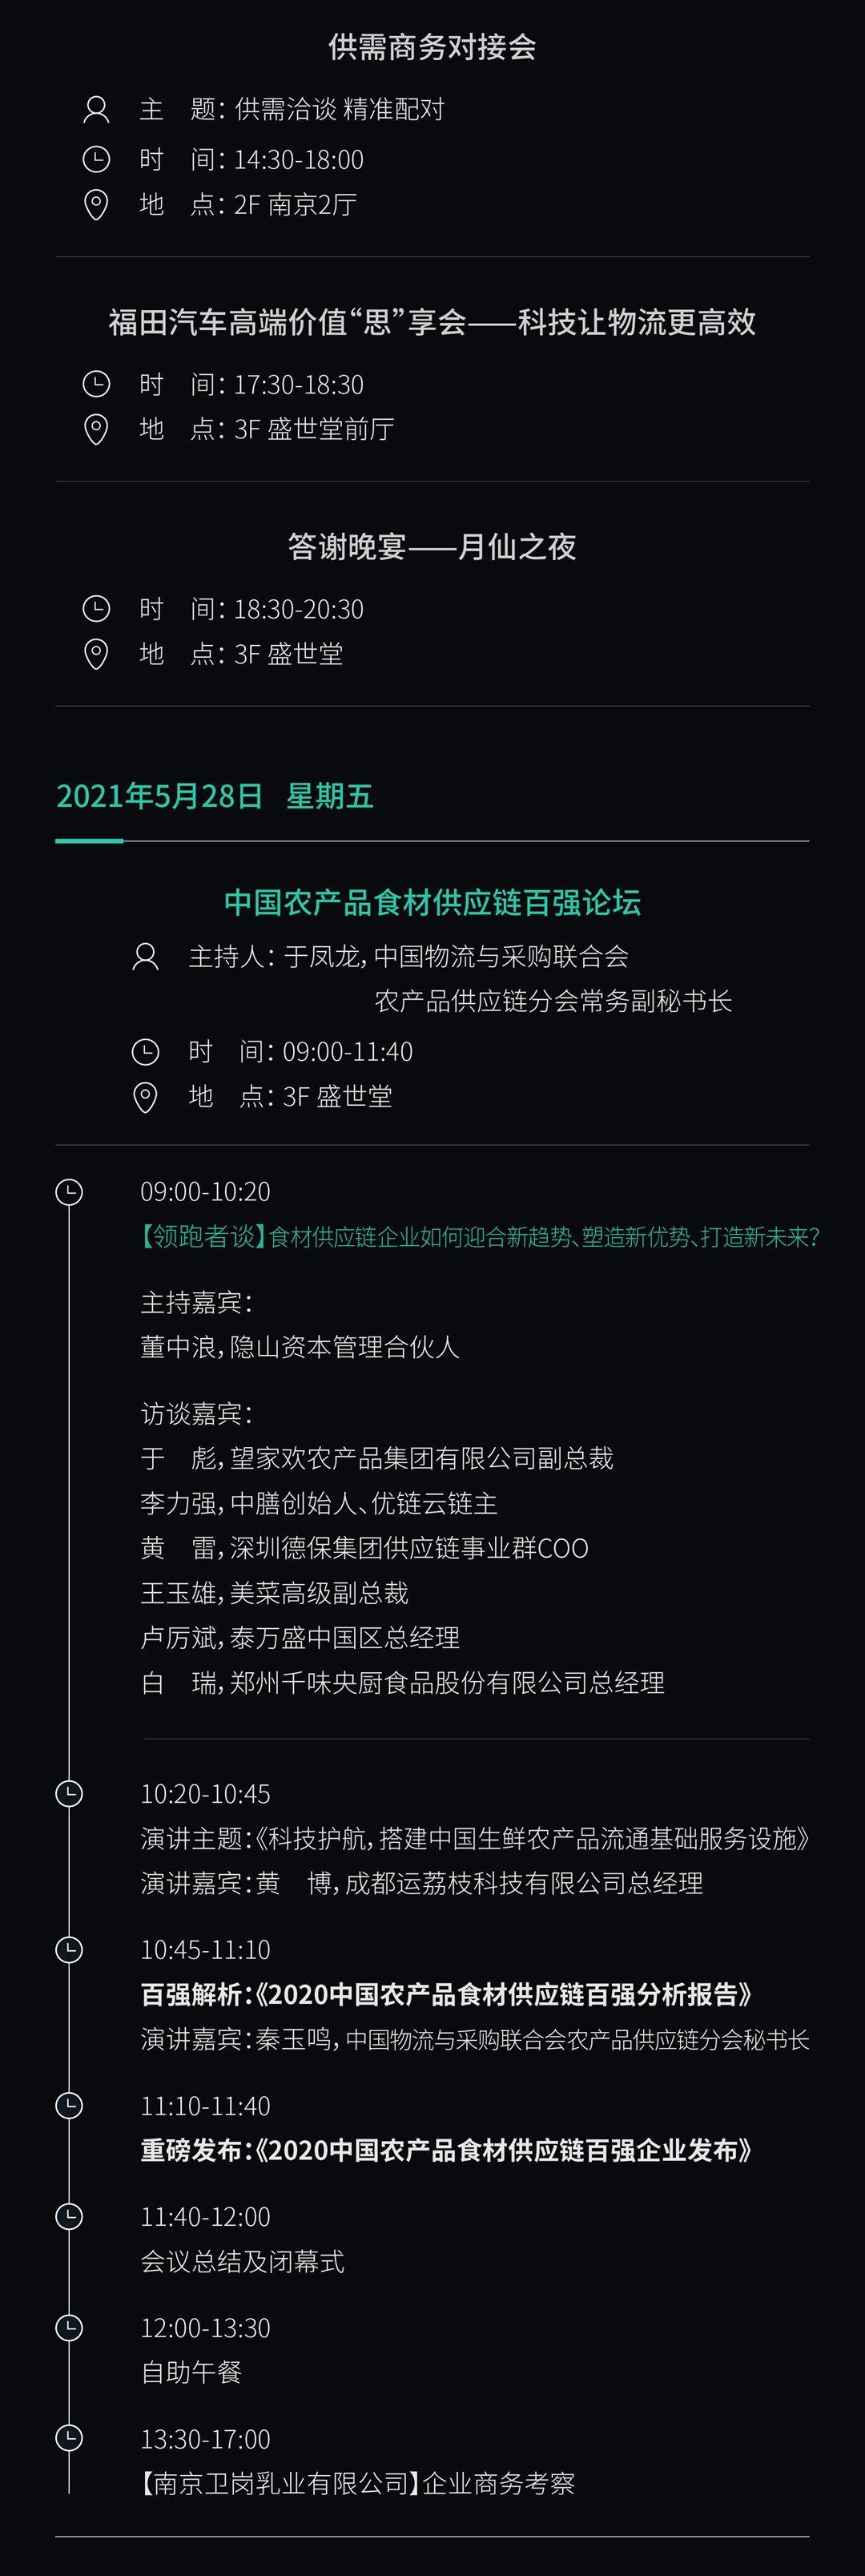 【20210511】议程长图_画板-1_06.png